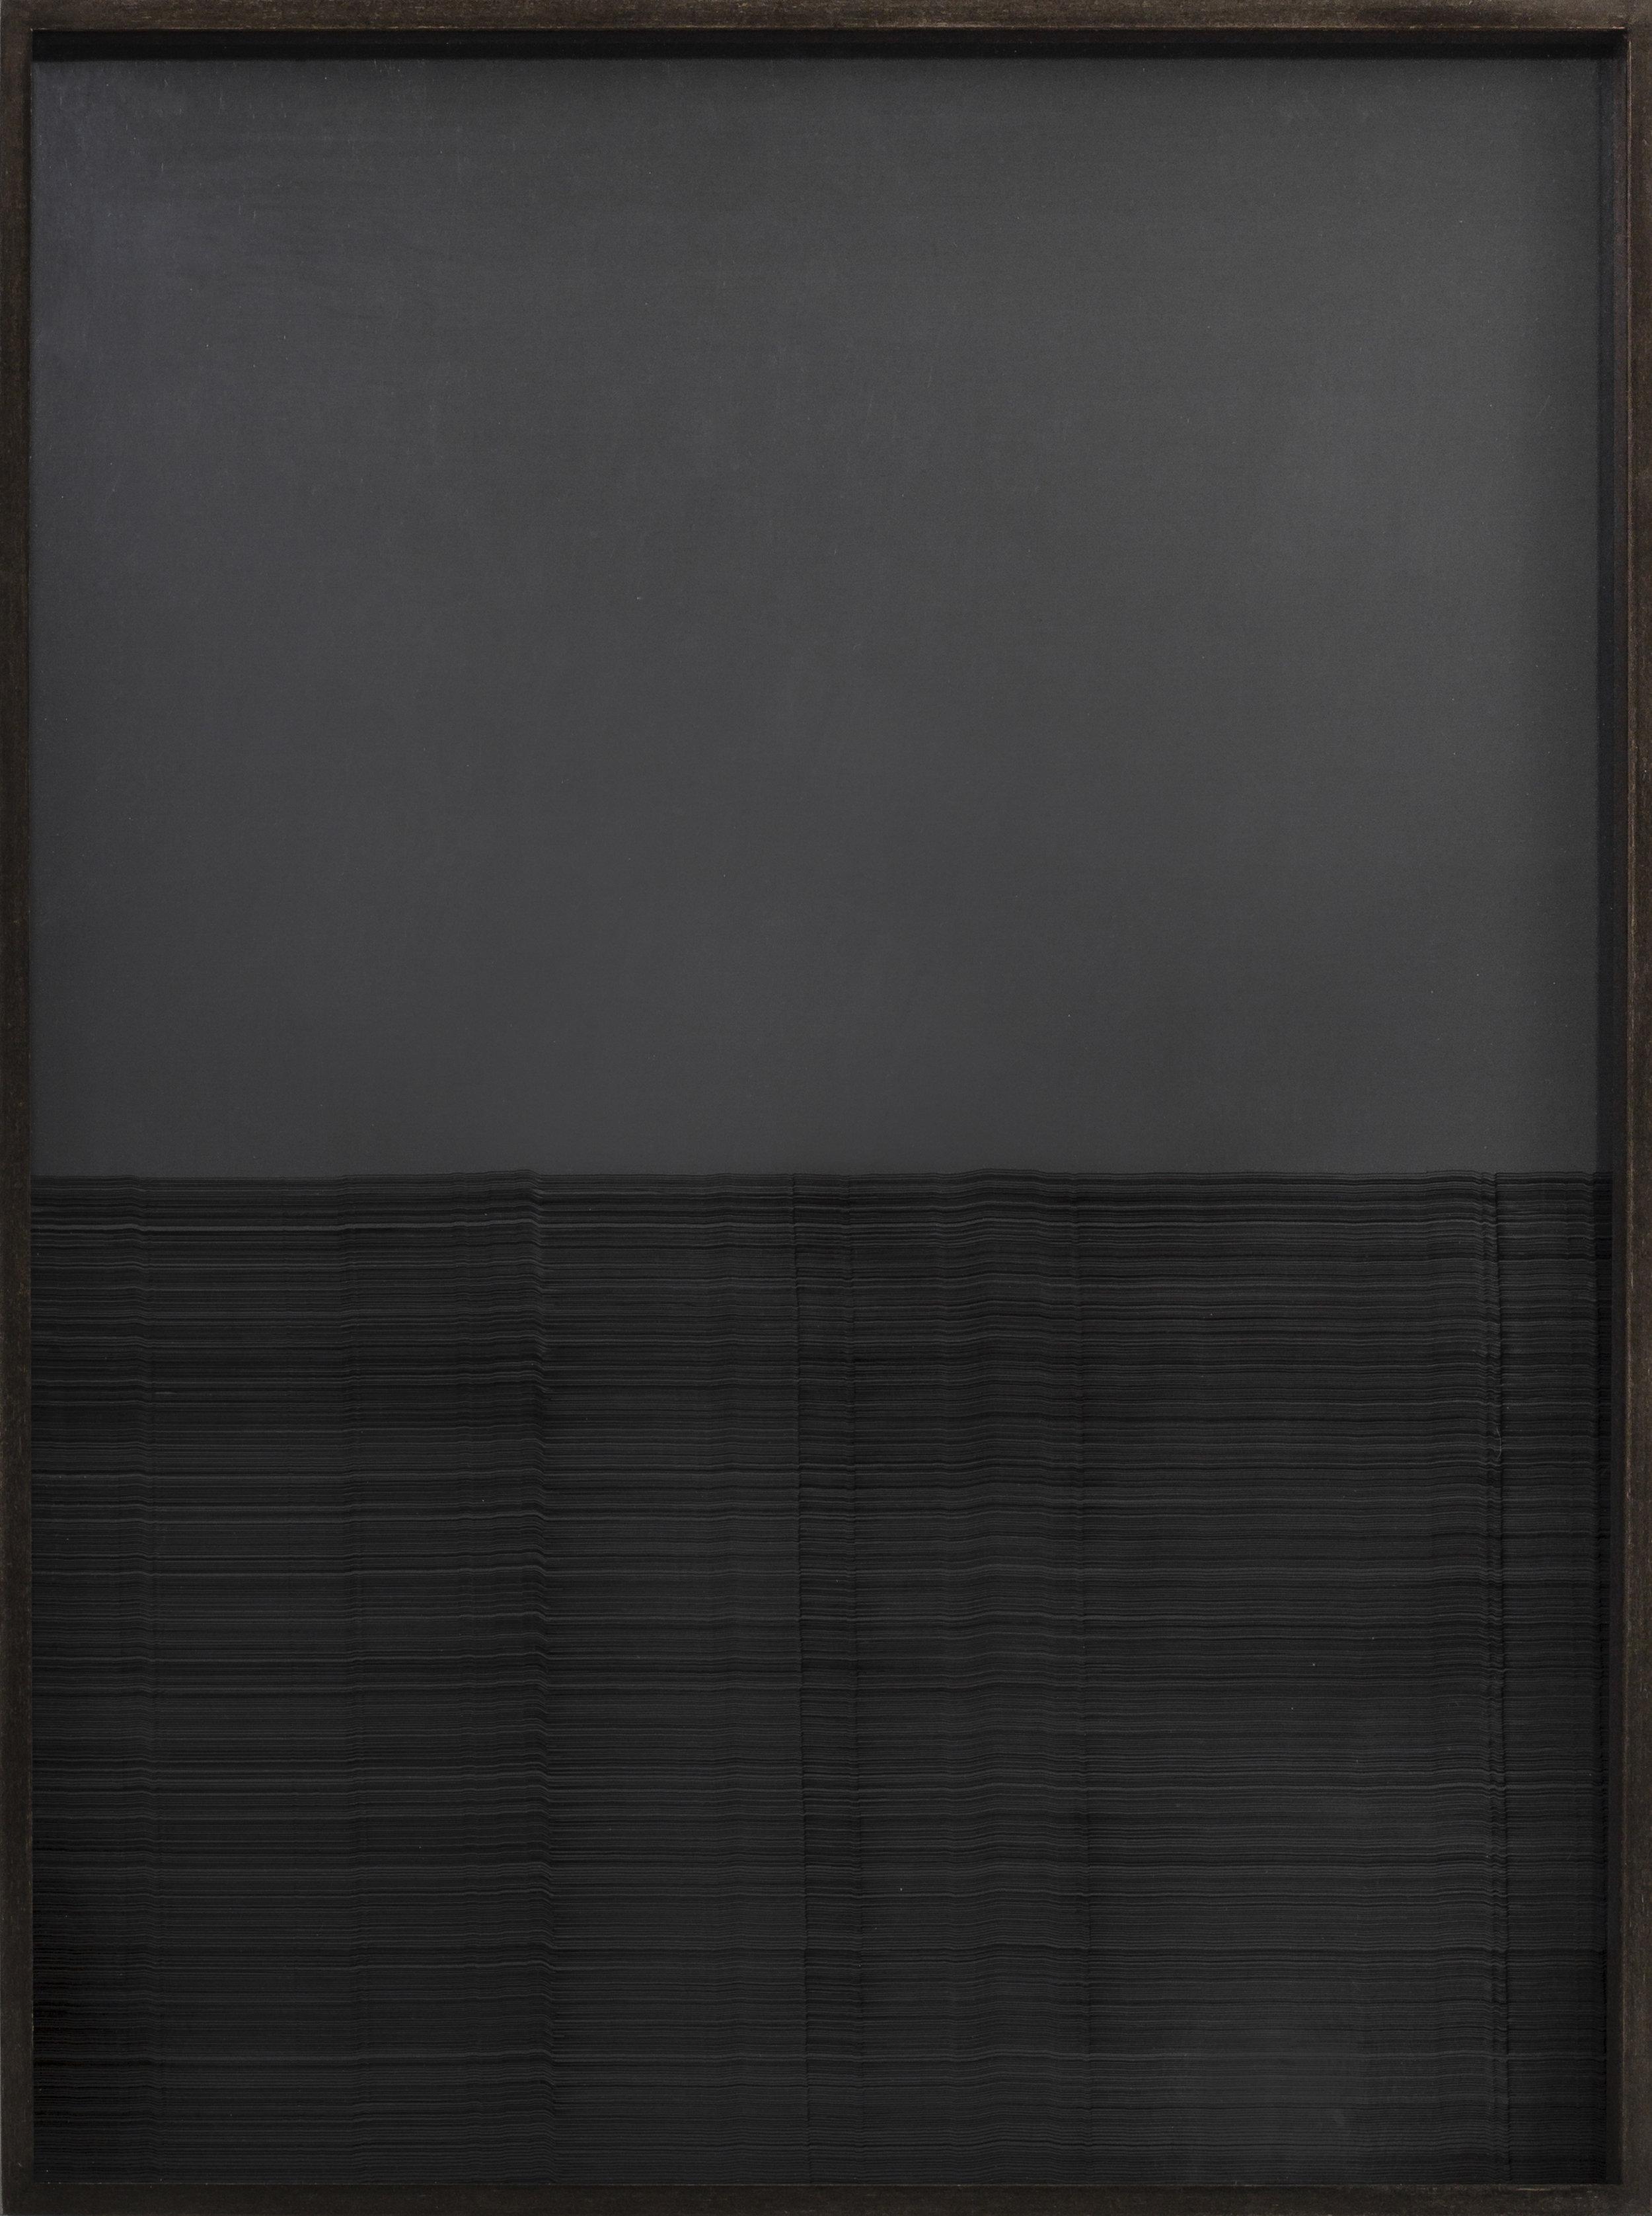 Anna Vogel, Radar III, 2016, indian ink on pigment print in artist's frame, 67 x 50,5 cm